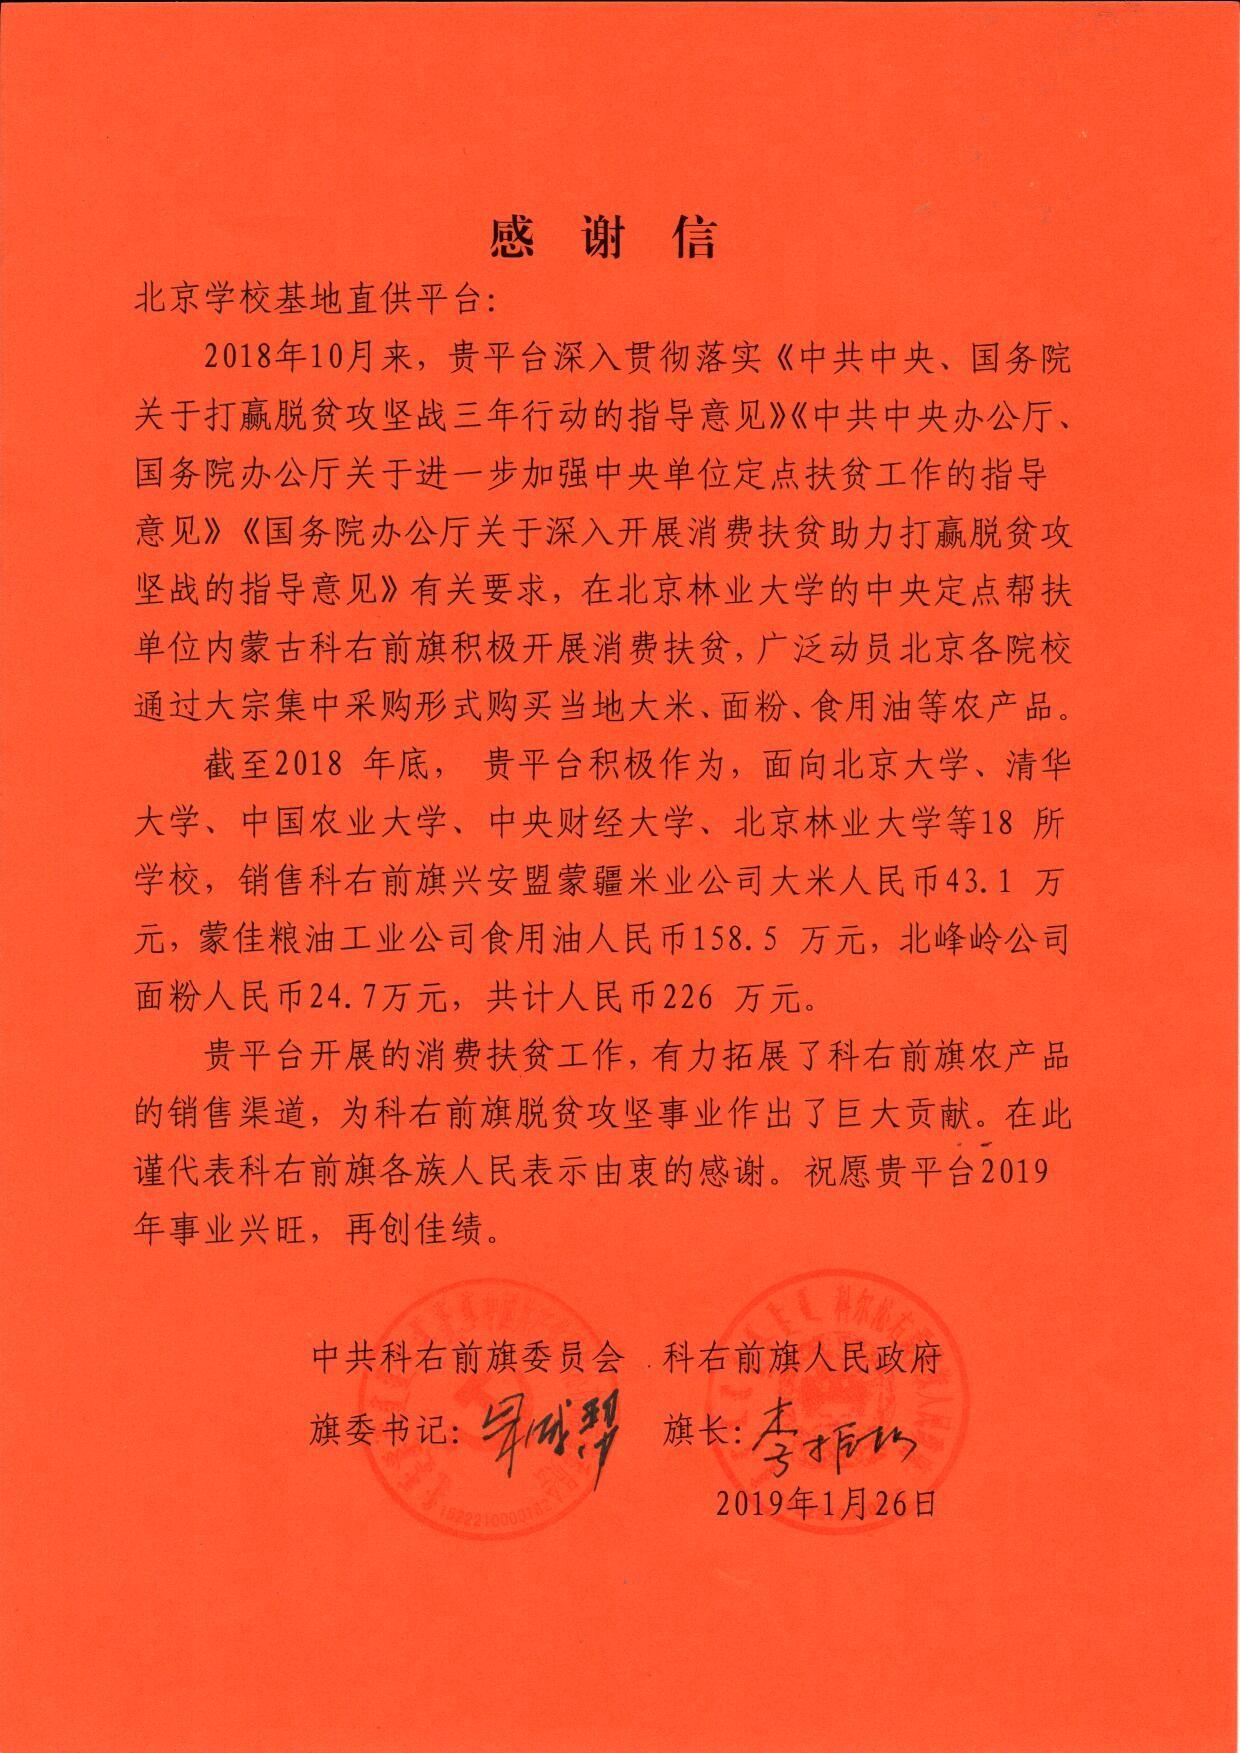 http://img.bjjdzg.com/shop/article/06044131537258616.jpg